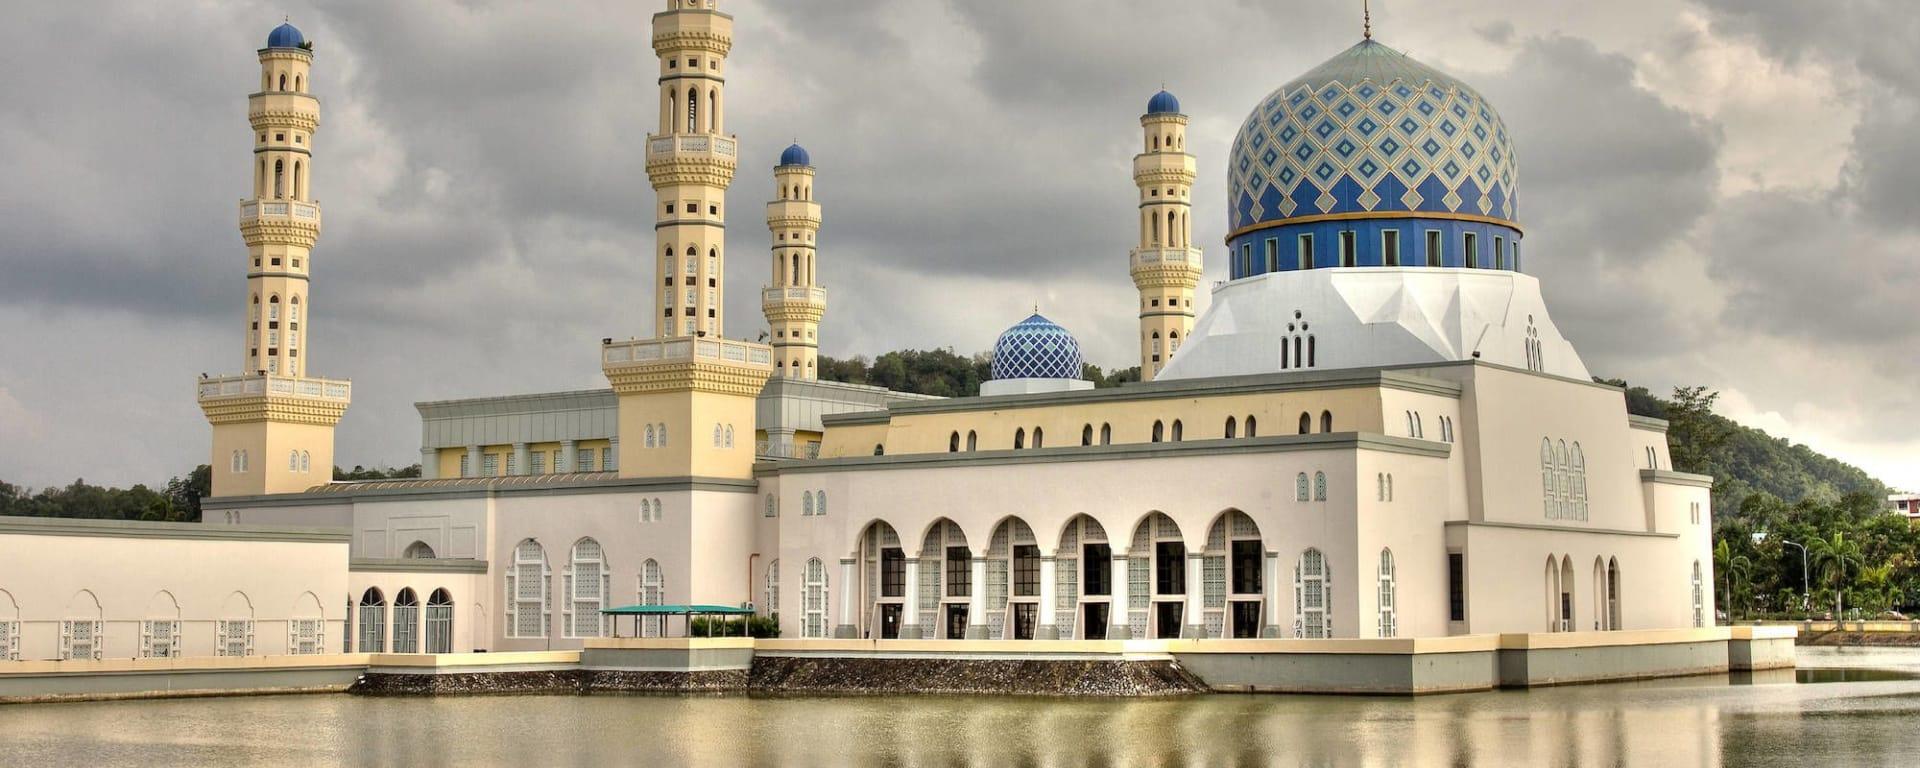 Les hauts lieux de Bornéo option longhouse de Kuching: Kota Kinabalu: Masjid Terapung Likas - City Mosque